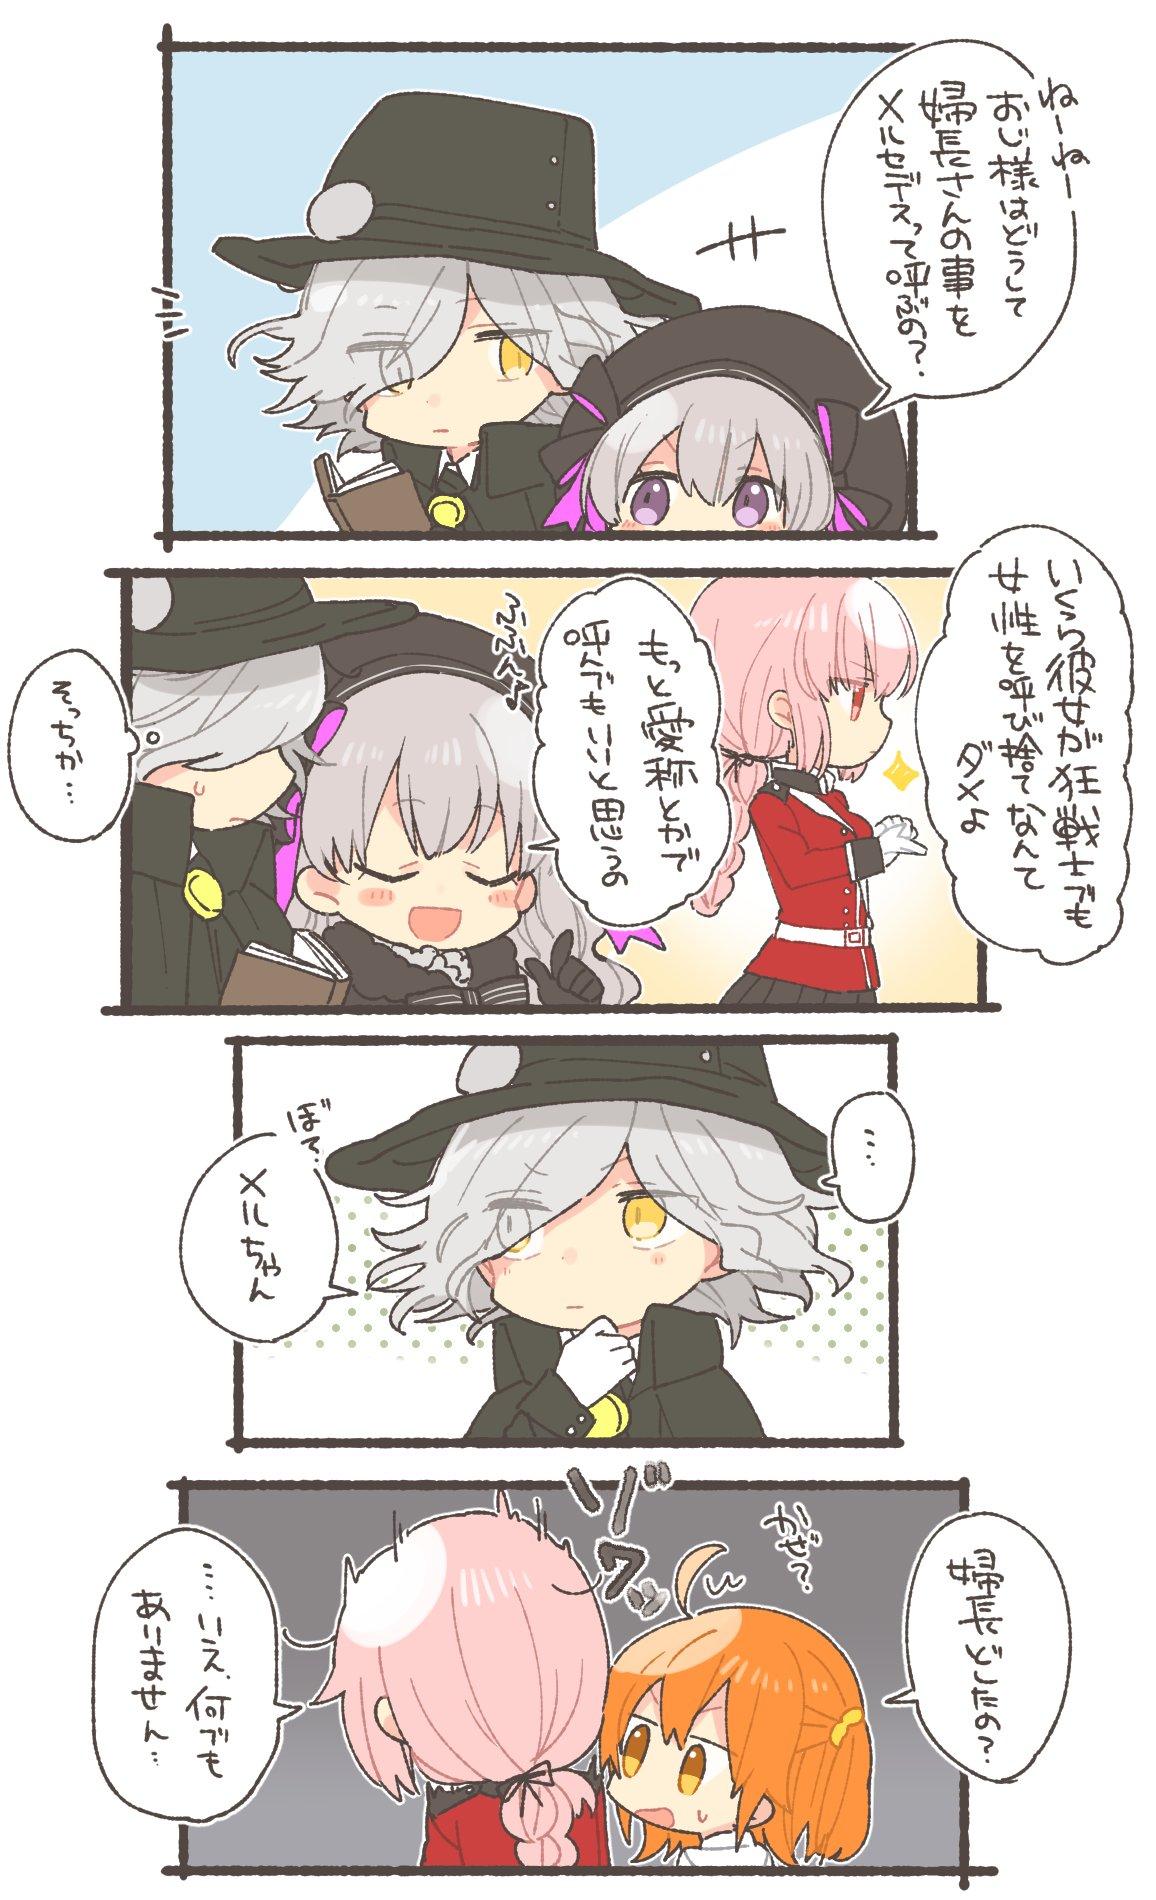 fate grand order translation